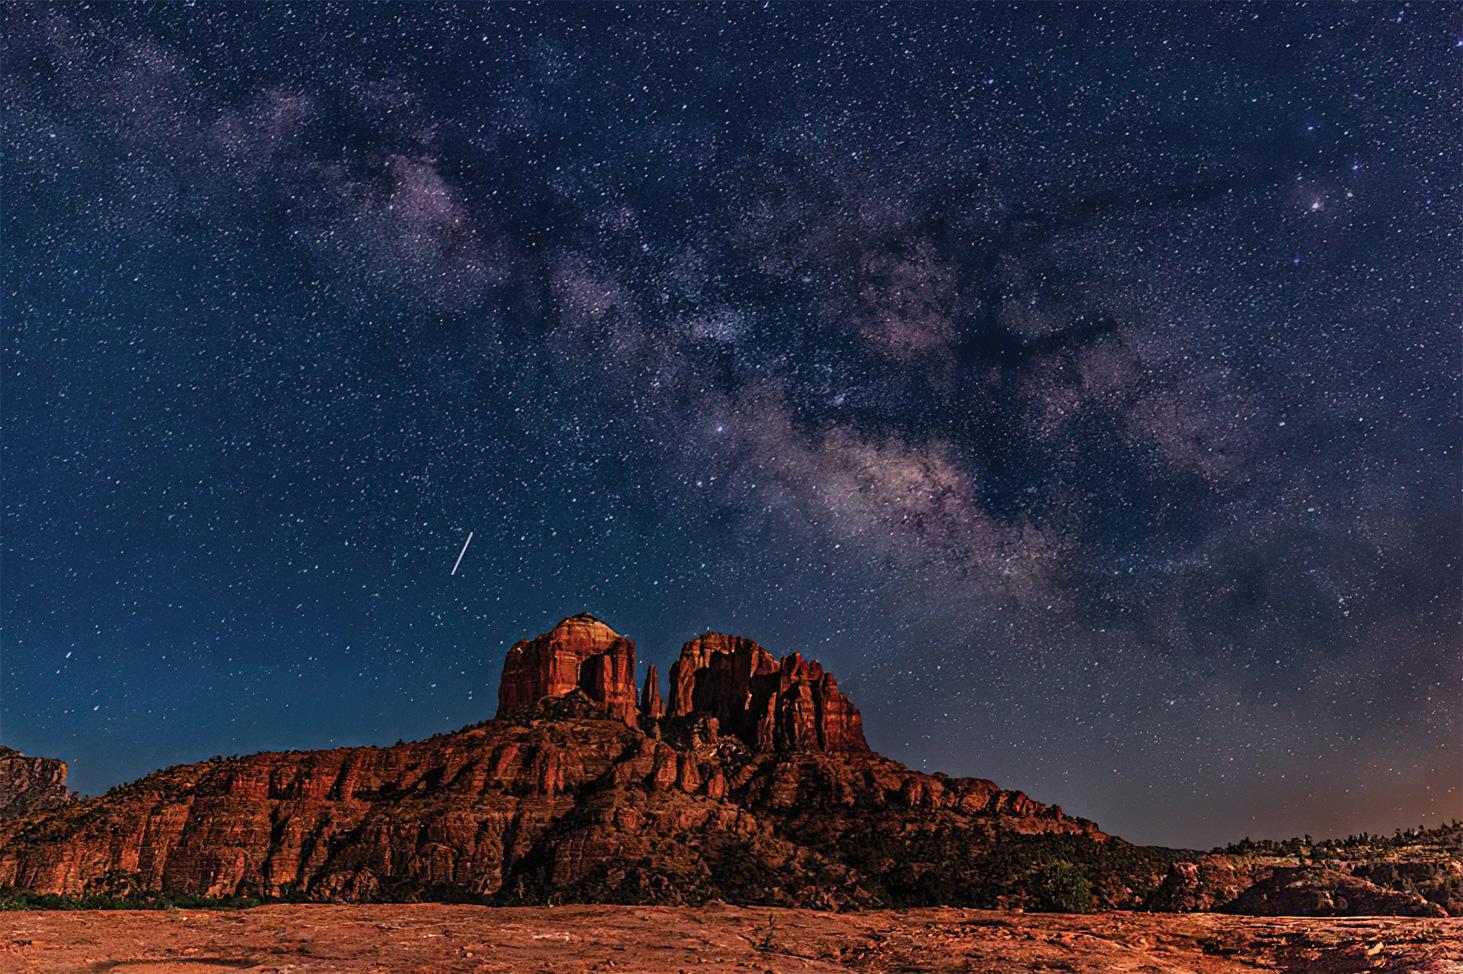 Milky Way over Sedona by Janet Ballard